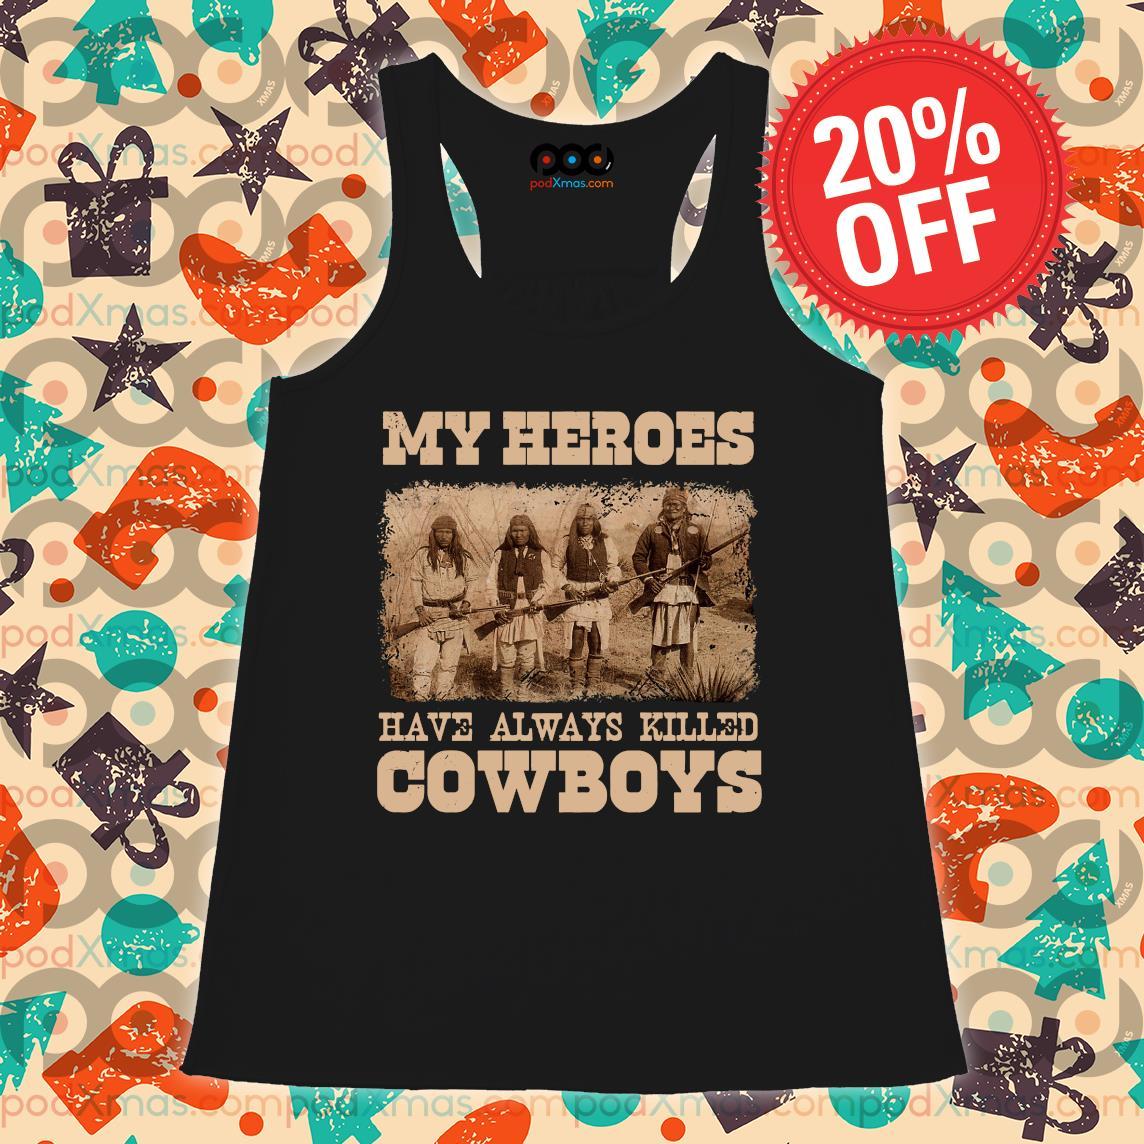 Native My heroes have always killed cowboys s Flowy tank PODxmas den